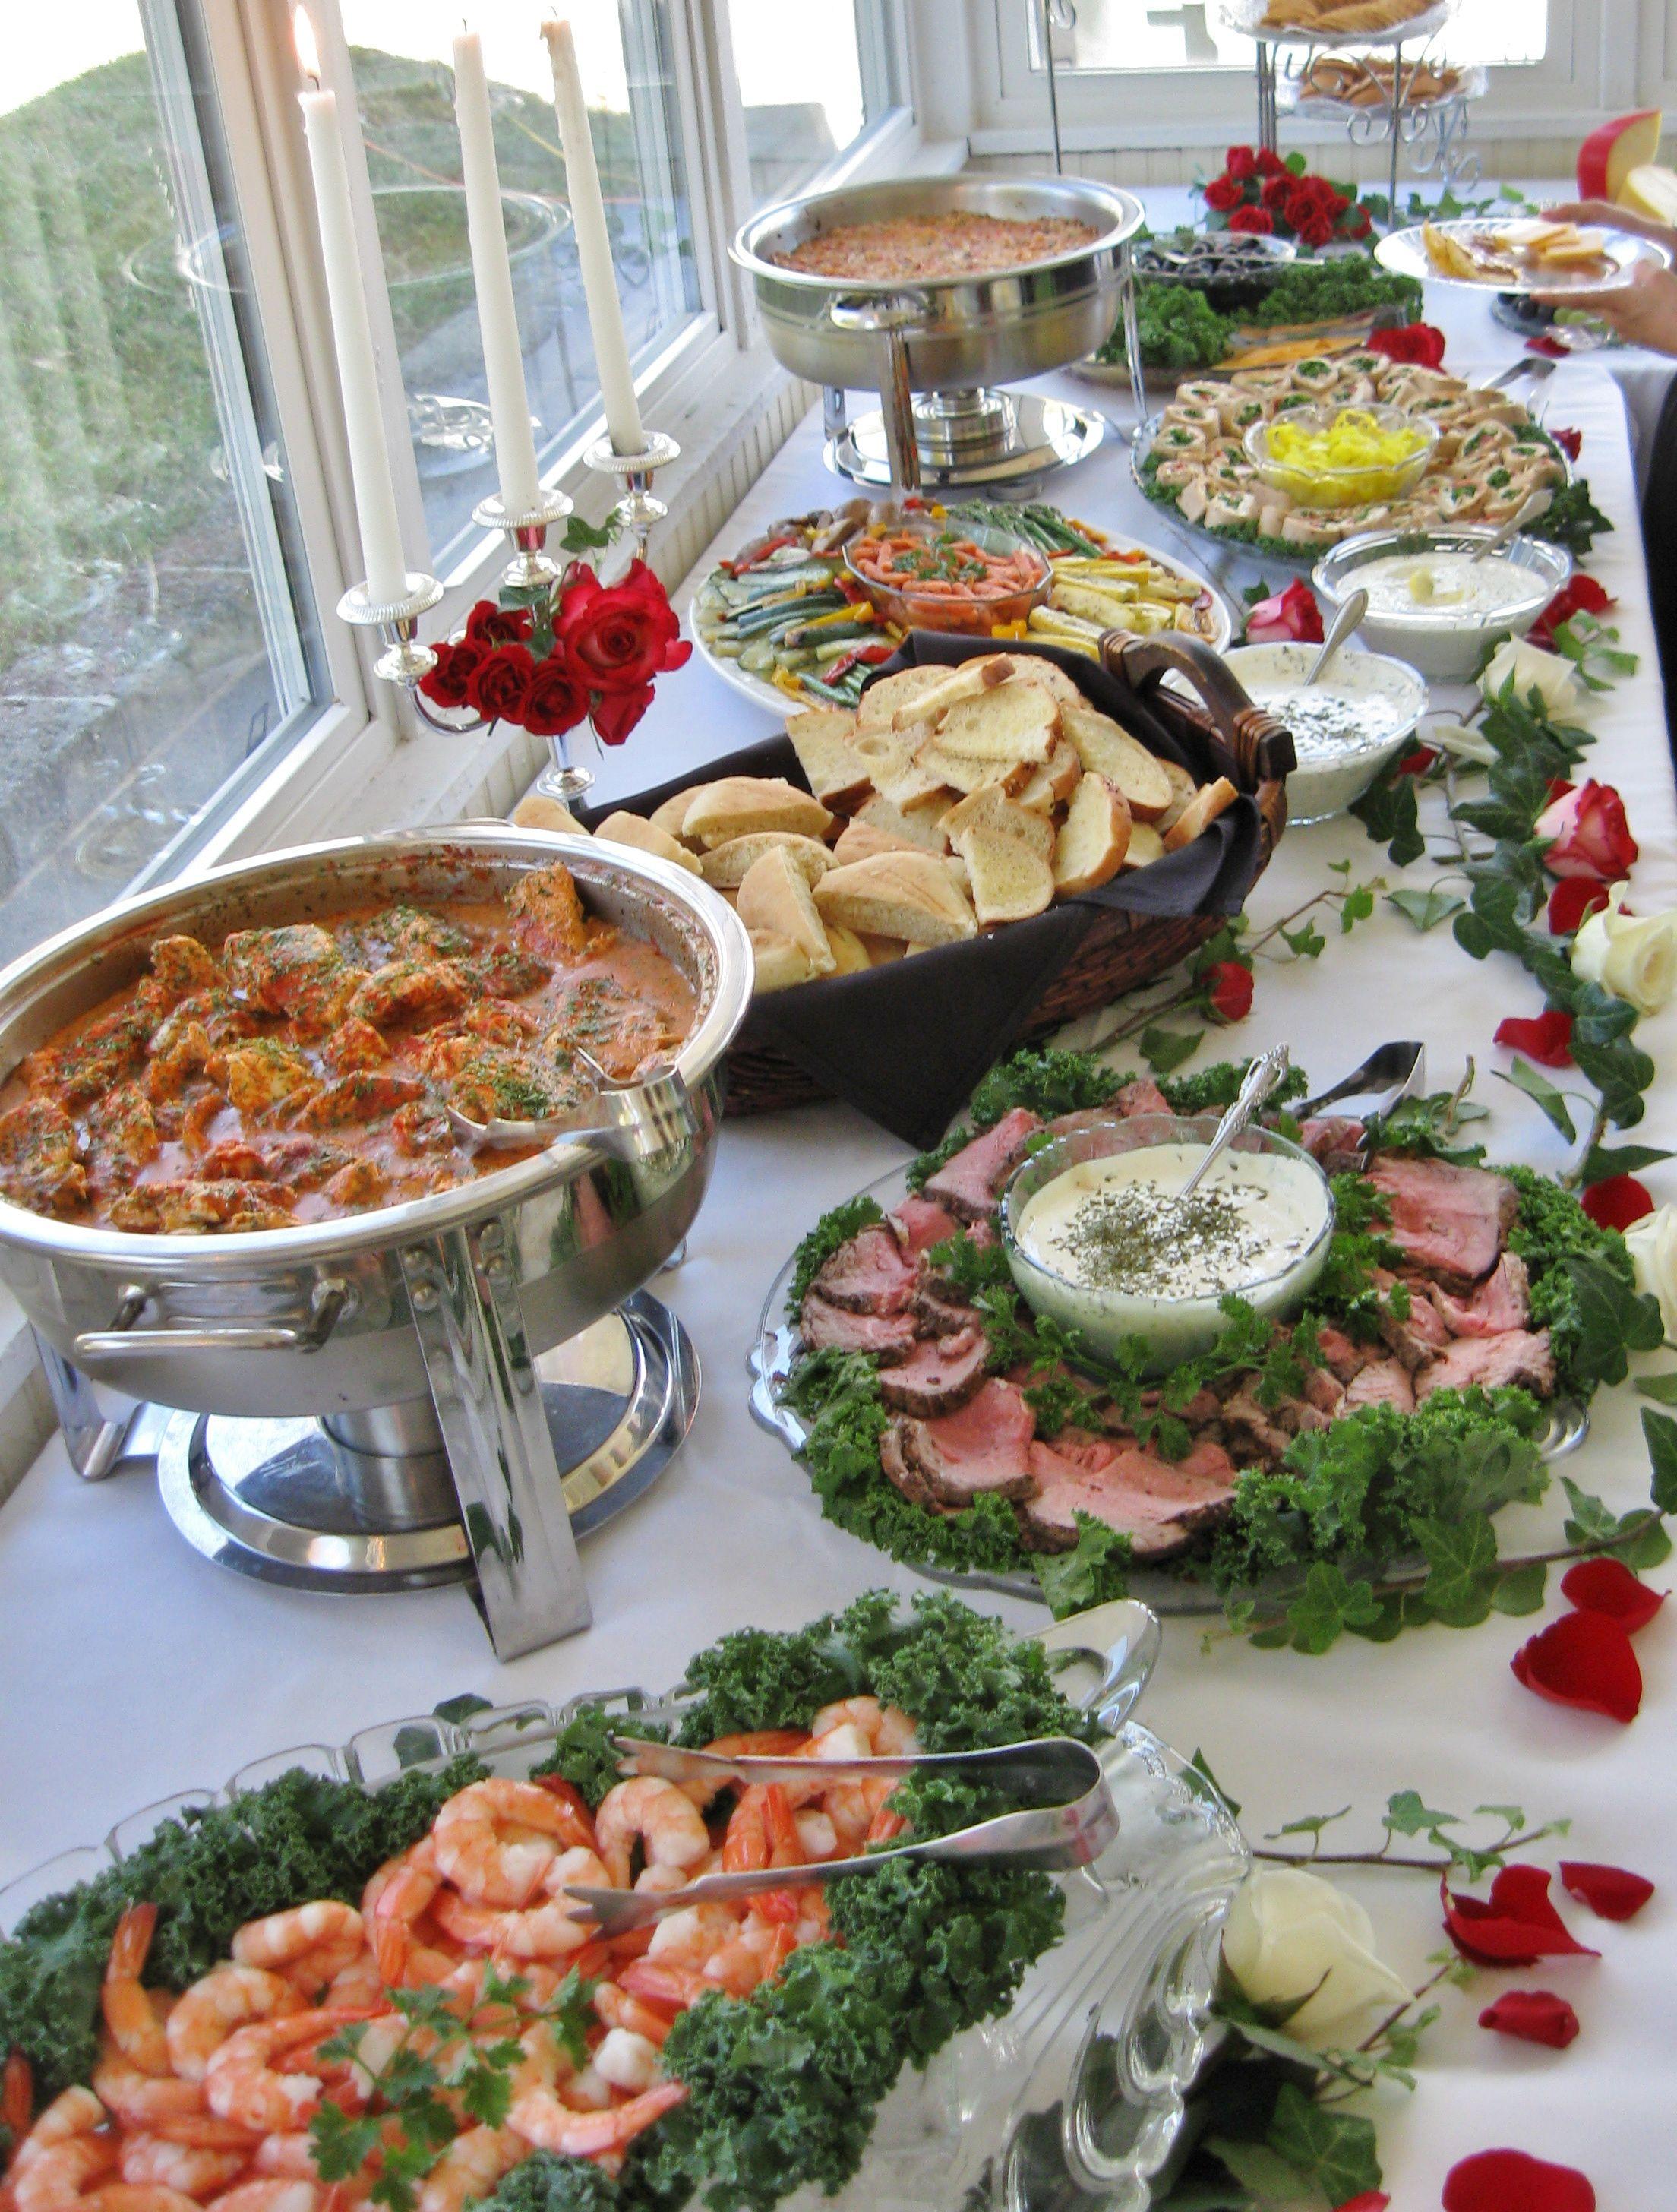 watermelon wedding appetizer idea | Dinner Party Hostess ... |Hot For Wedding Appetizers